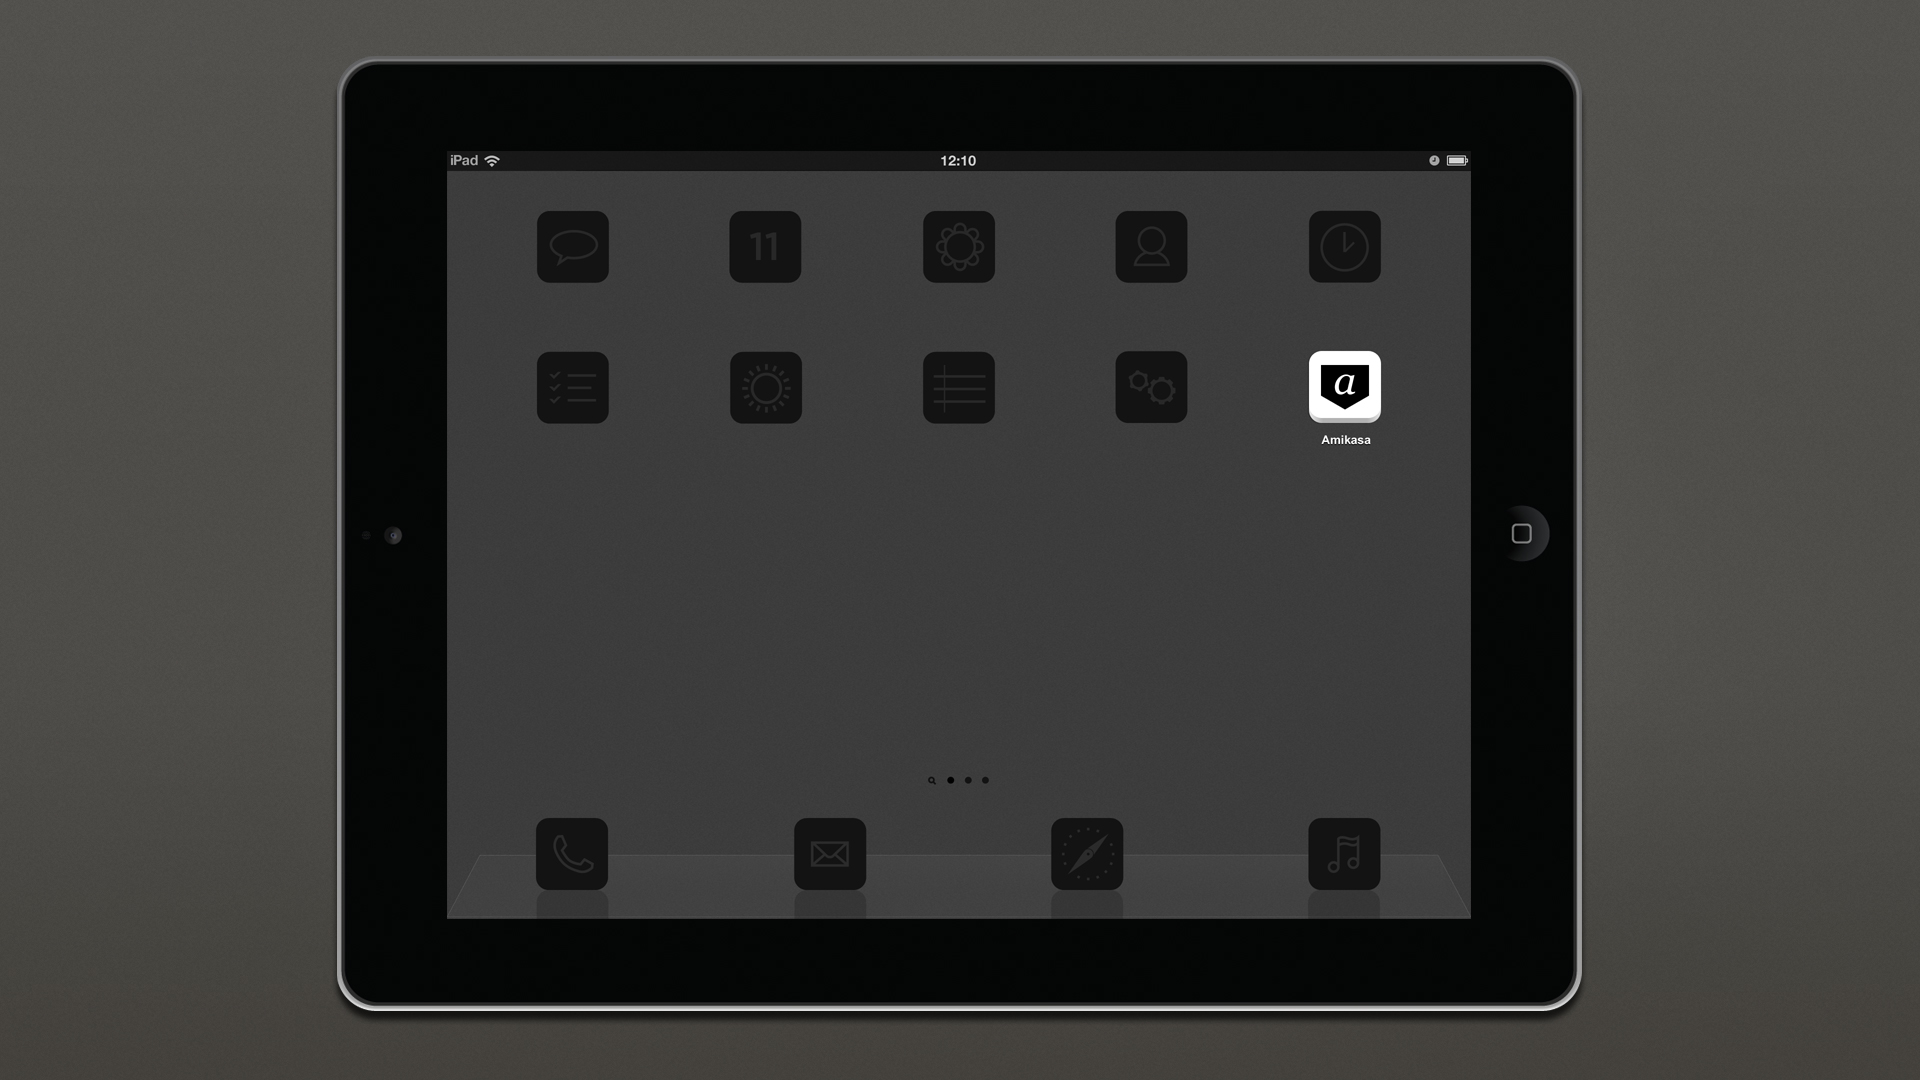 amikasa_touch_ipad_gui_desktop_04.jpg